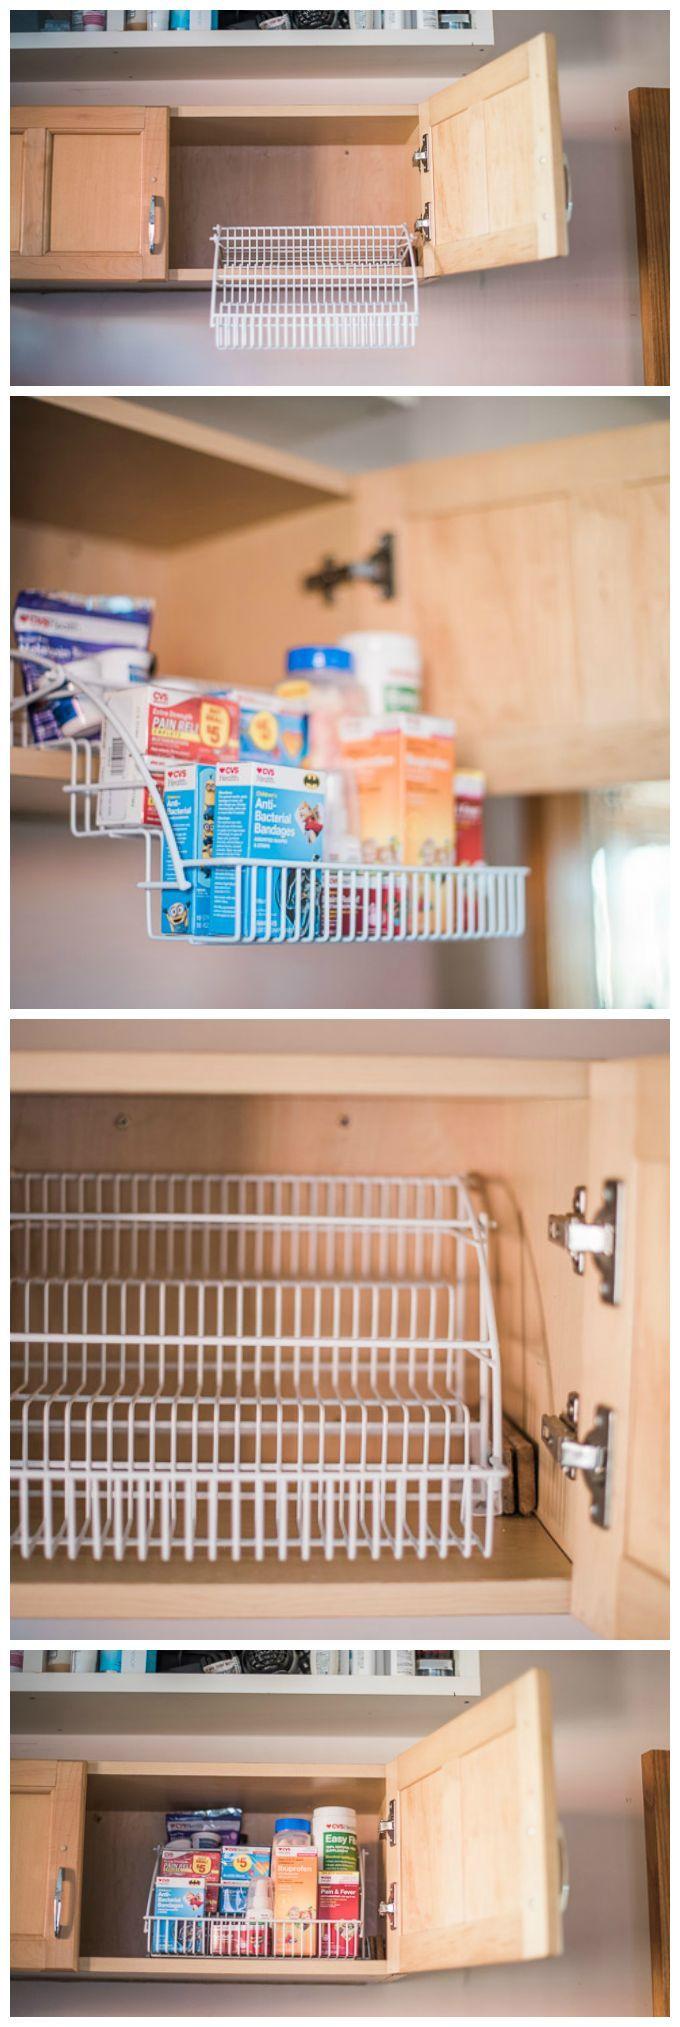 Hospital Medicine Cabinet 123 Best Images About Organized Medicine Cabinets On Pinterest